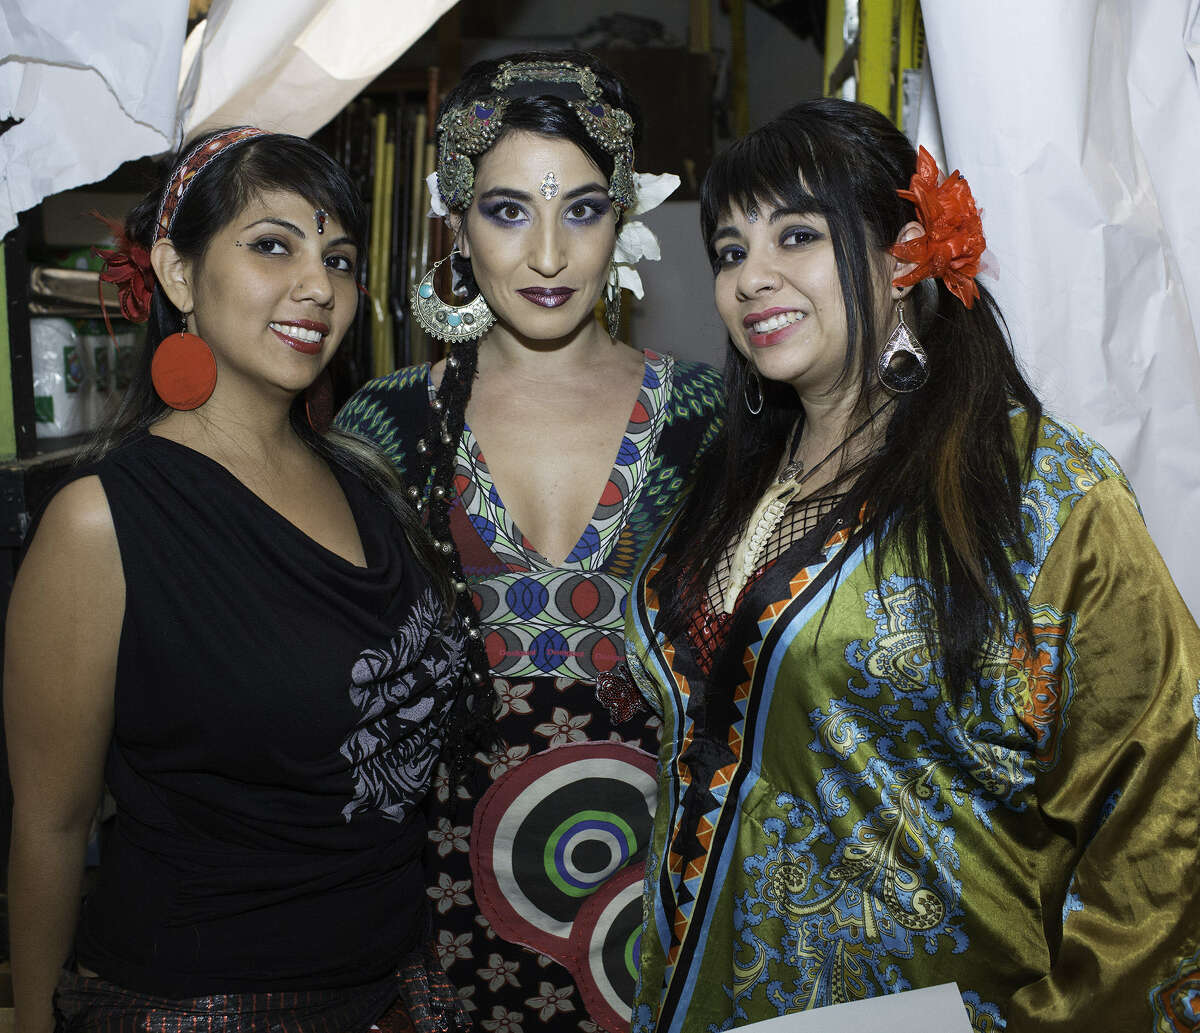 Marisa Gonzalez (from left), Silvia Salamanca and Gio Bazaldua